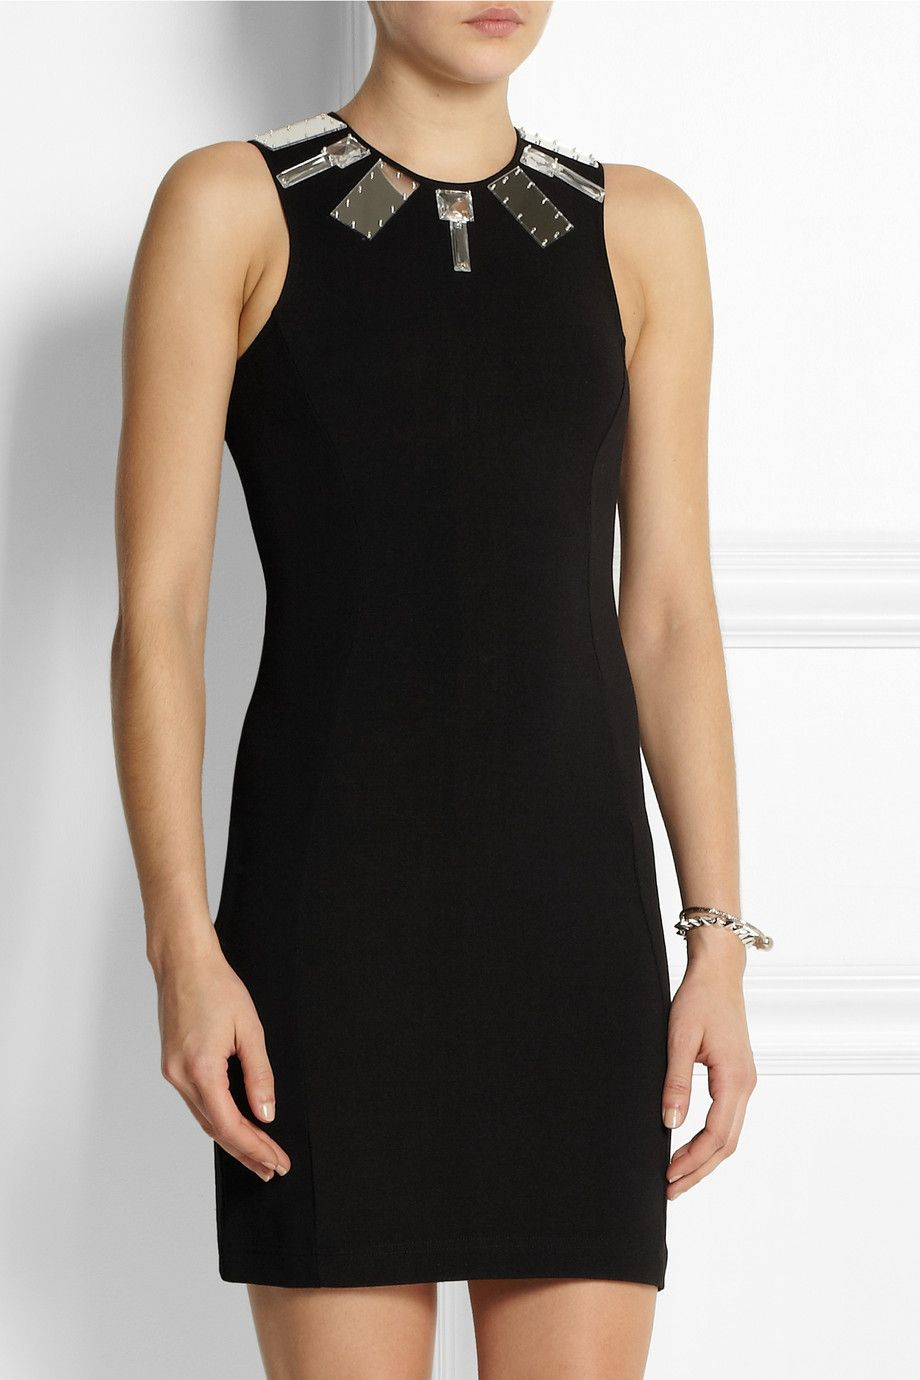 Markus Lupfer Mirror-embellished stretch-jersey mini dress NET-A-PORTER.COM